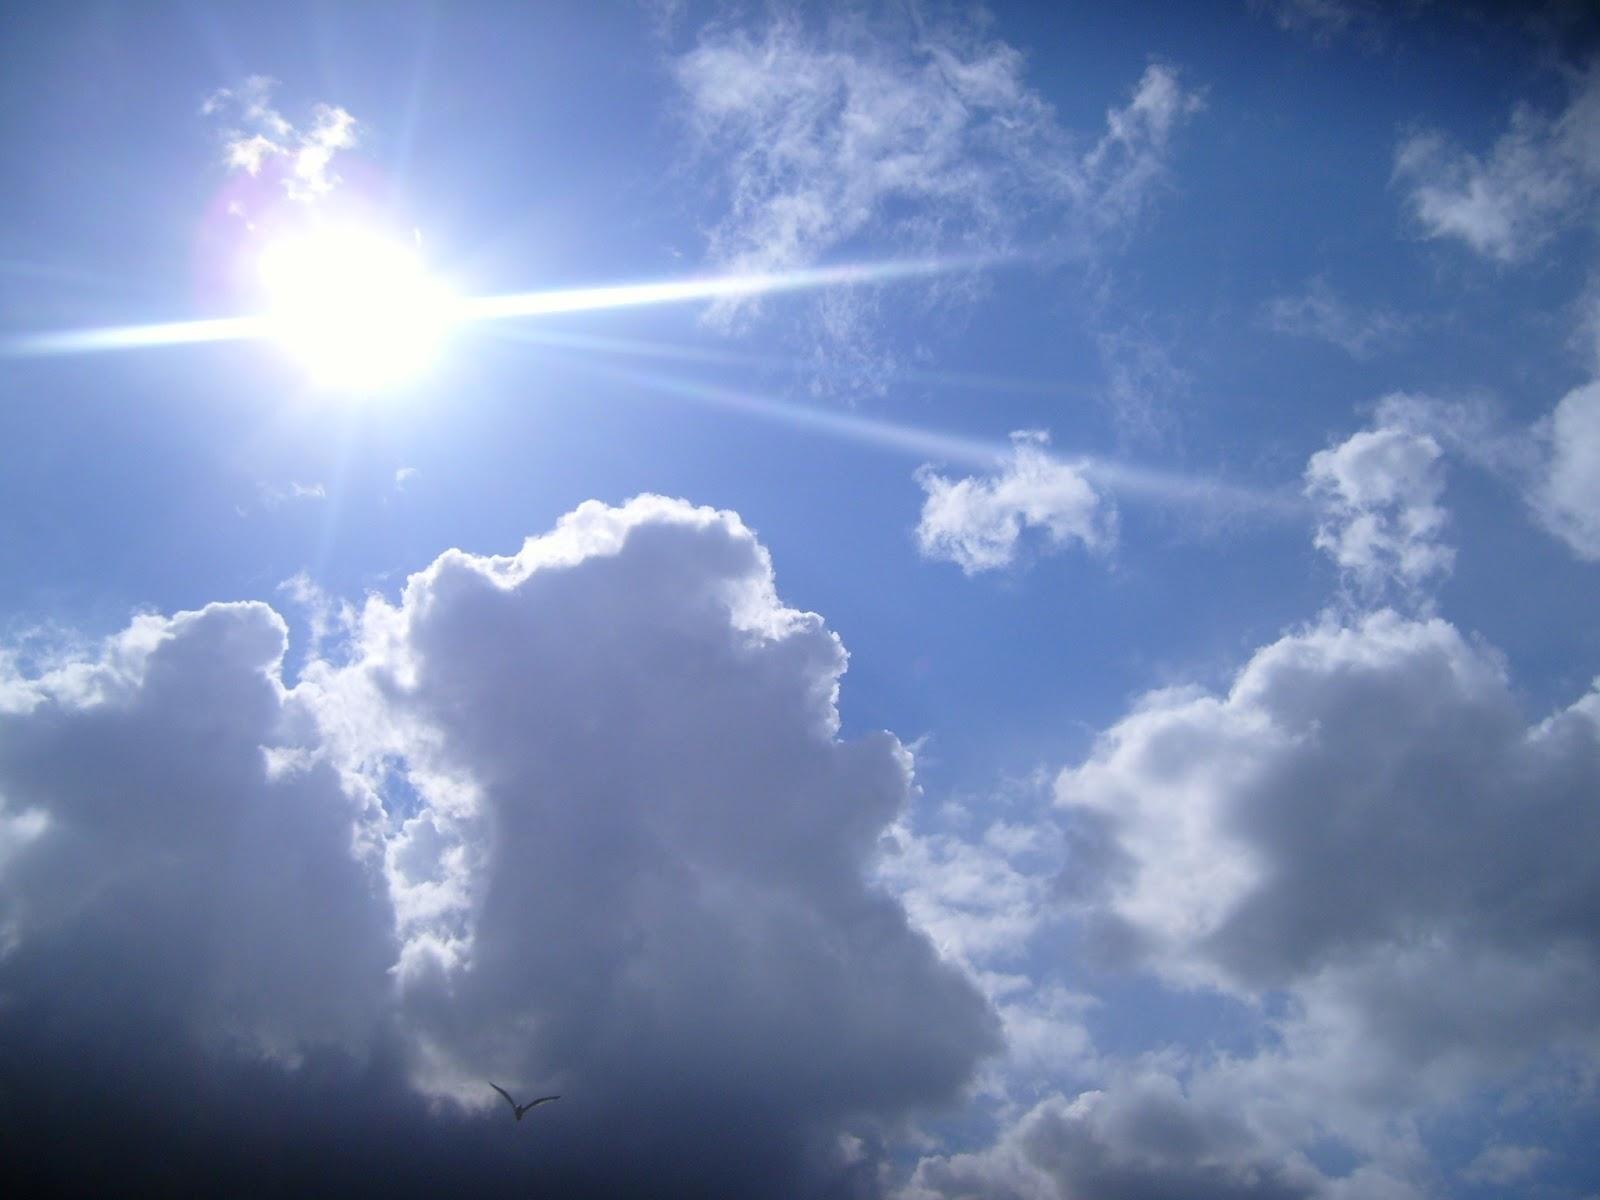 http://2.bp.blogspot.com/-IYtHqebvfms/UebuAe5MkcI/AAAAAAAABFk/KUj53SUOxpU/s1600/second-coming-clouds.jpg